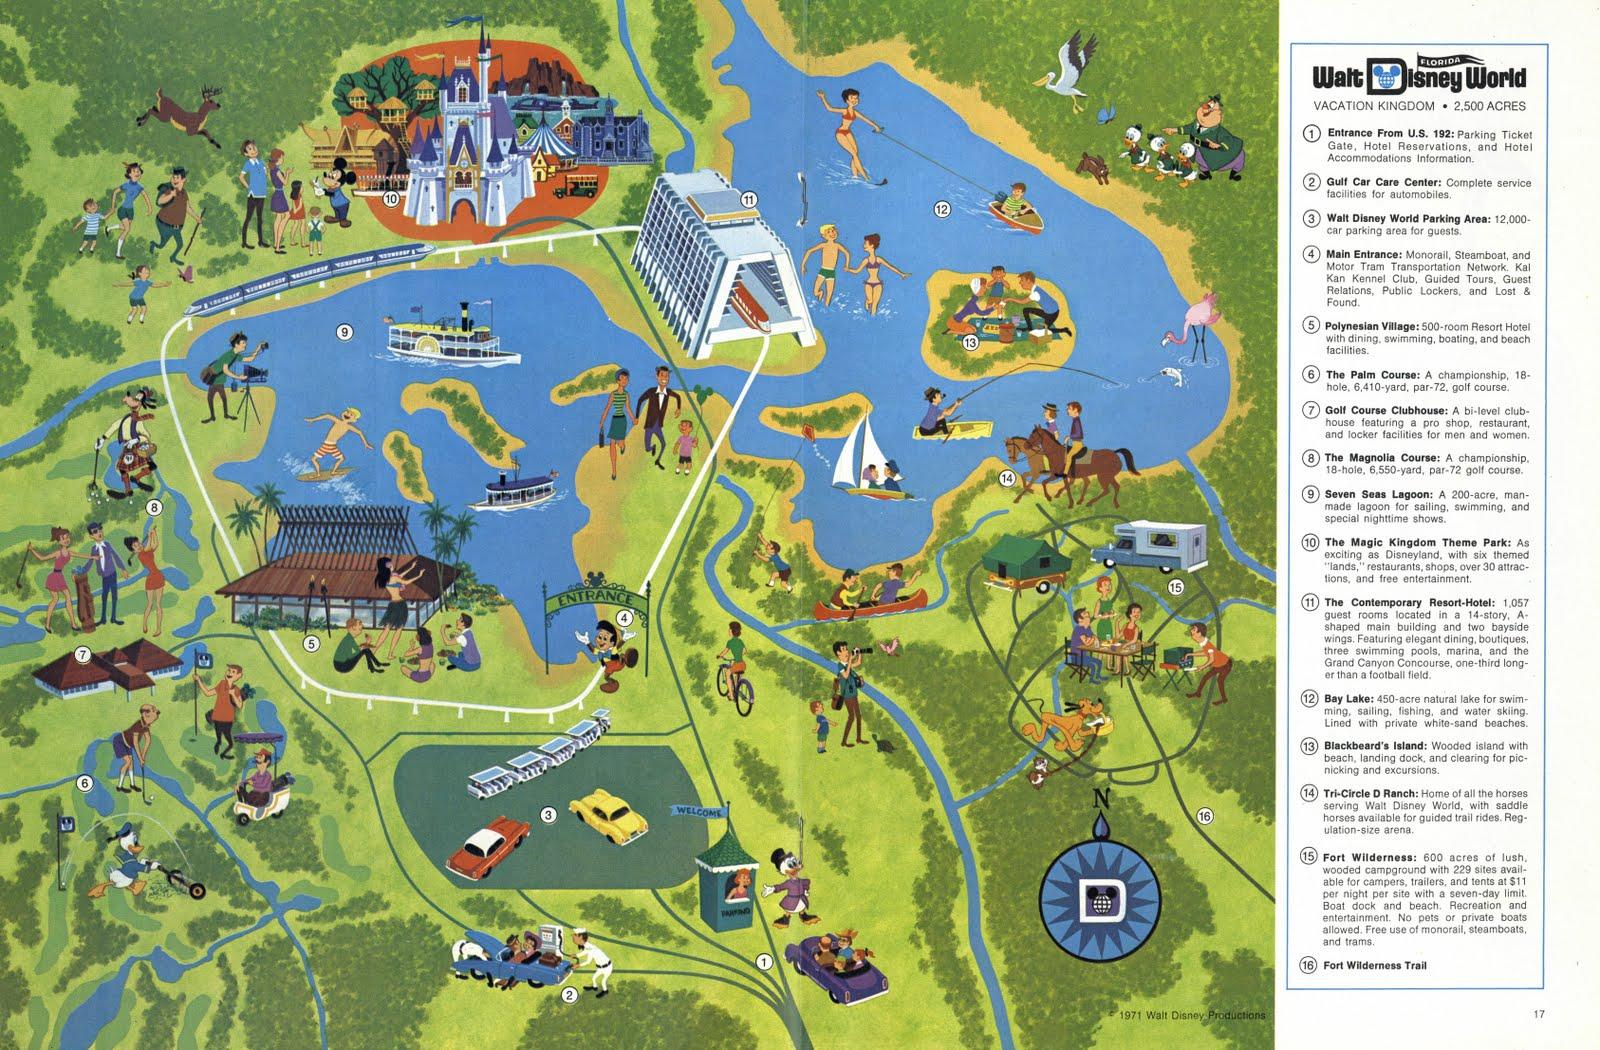 Vintage Disneyland Tickets Walt Disney Word Vacationland